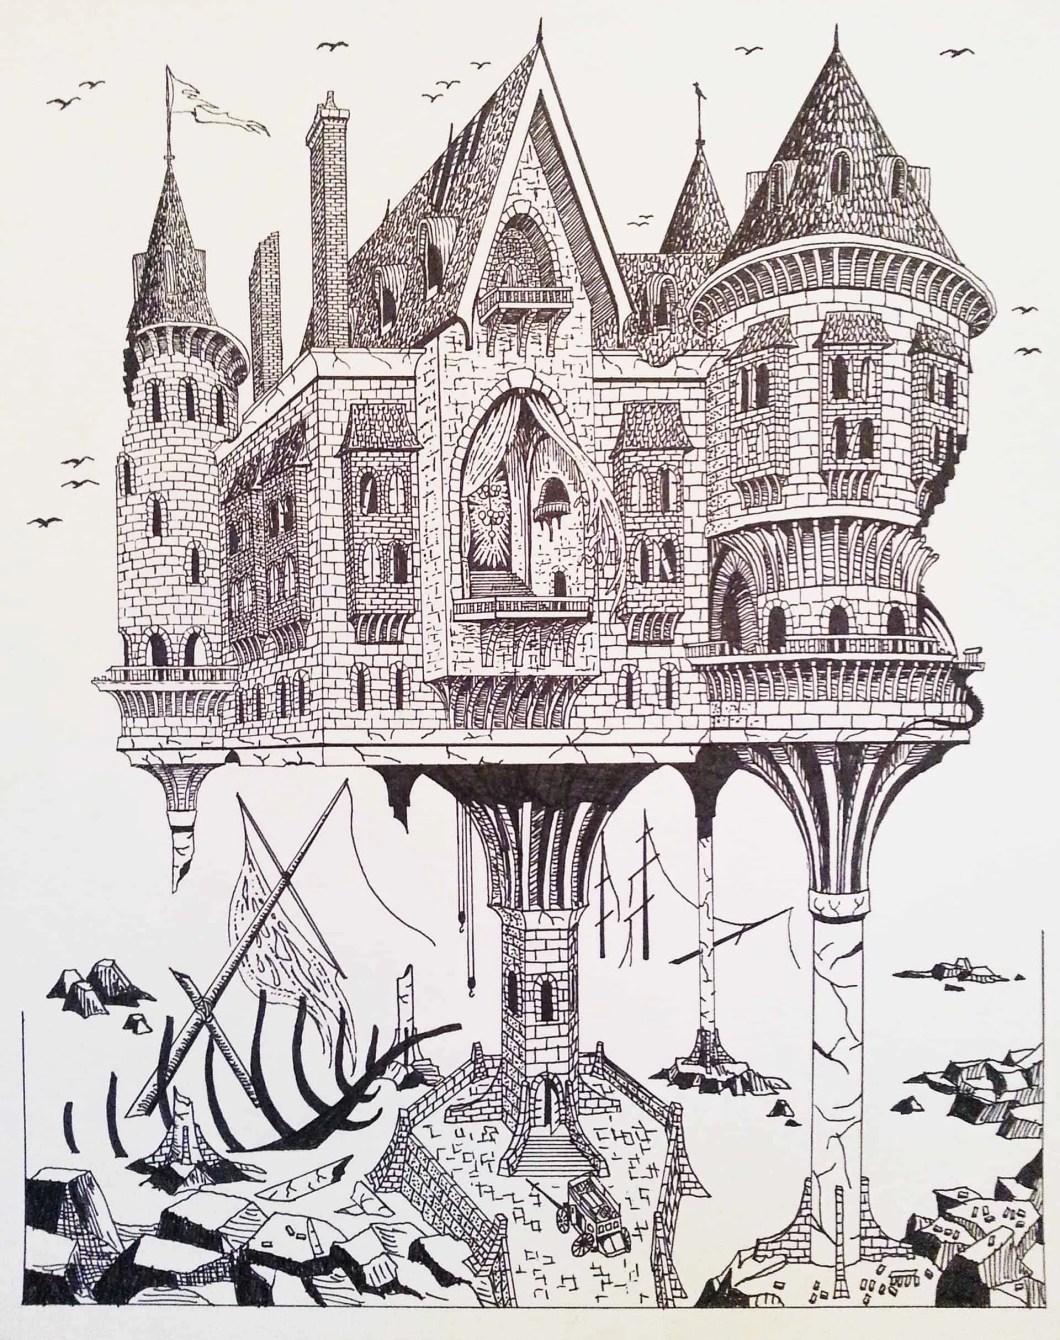 Fantasy castle pen and ink illustration by Clark Giesbrecht